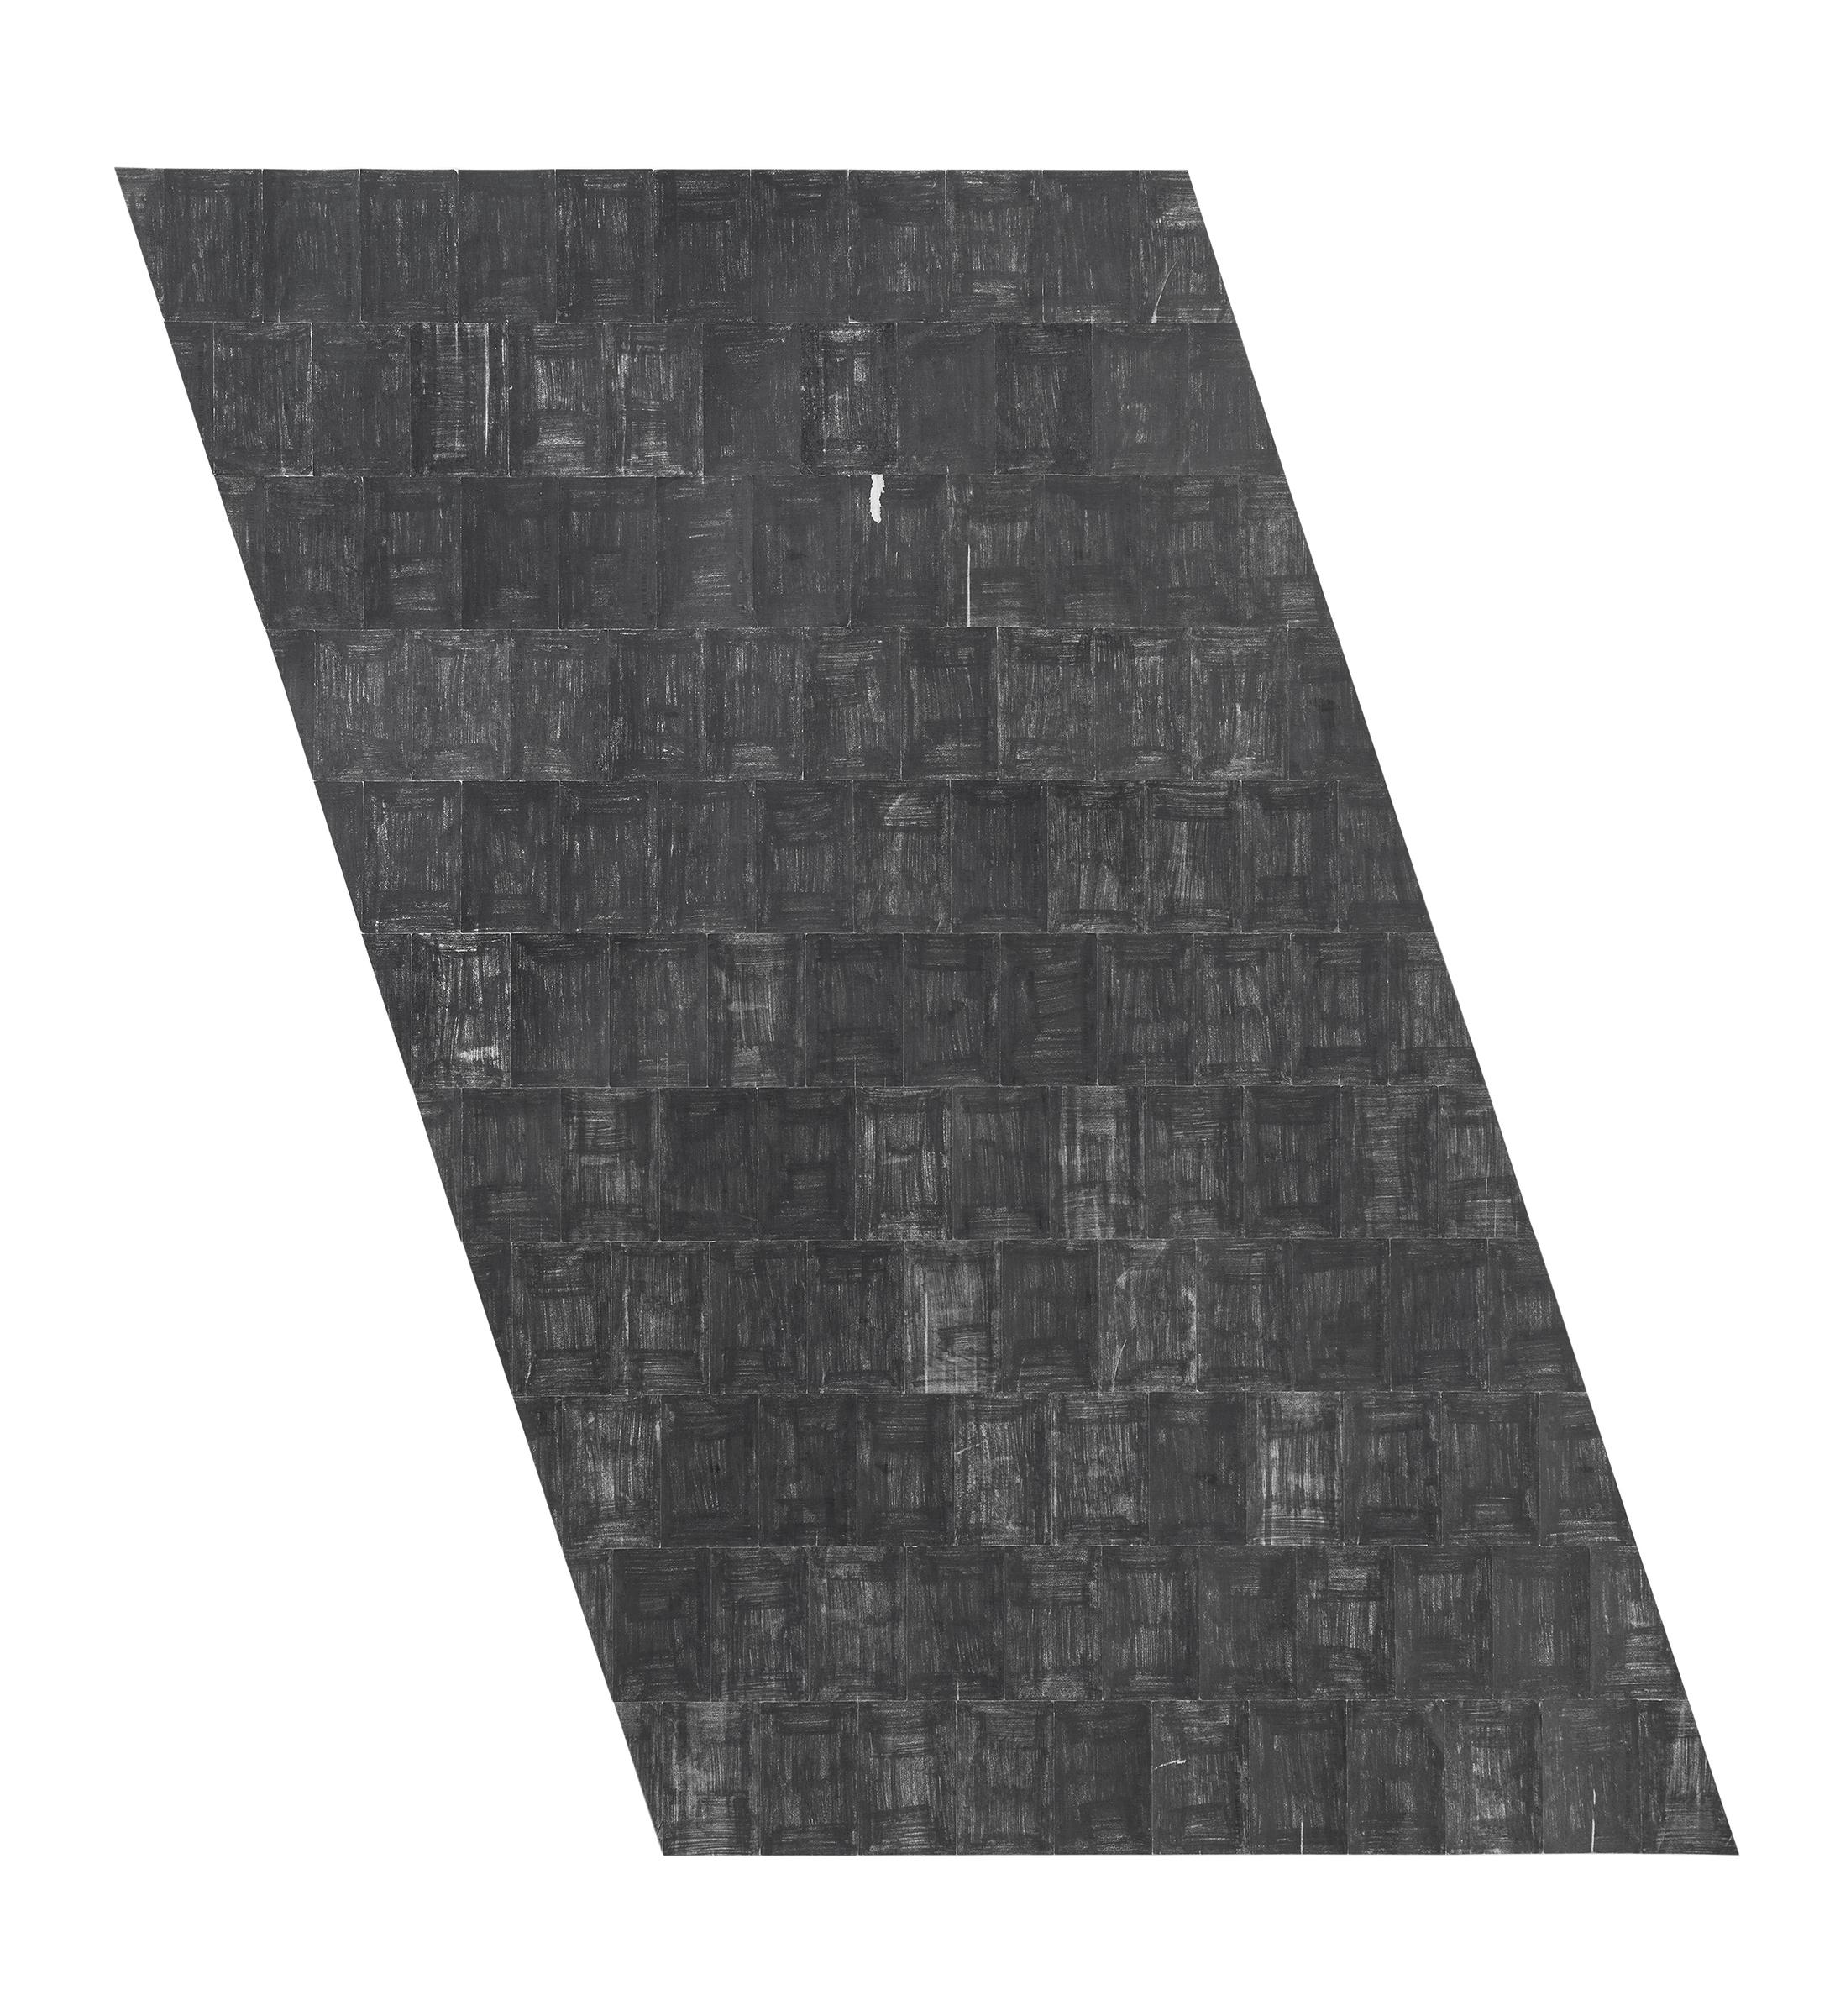 Agnes Lux, R3 , 2015 postcards, graphite. 63.8 x 38.6 in